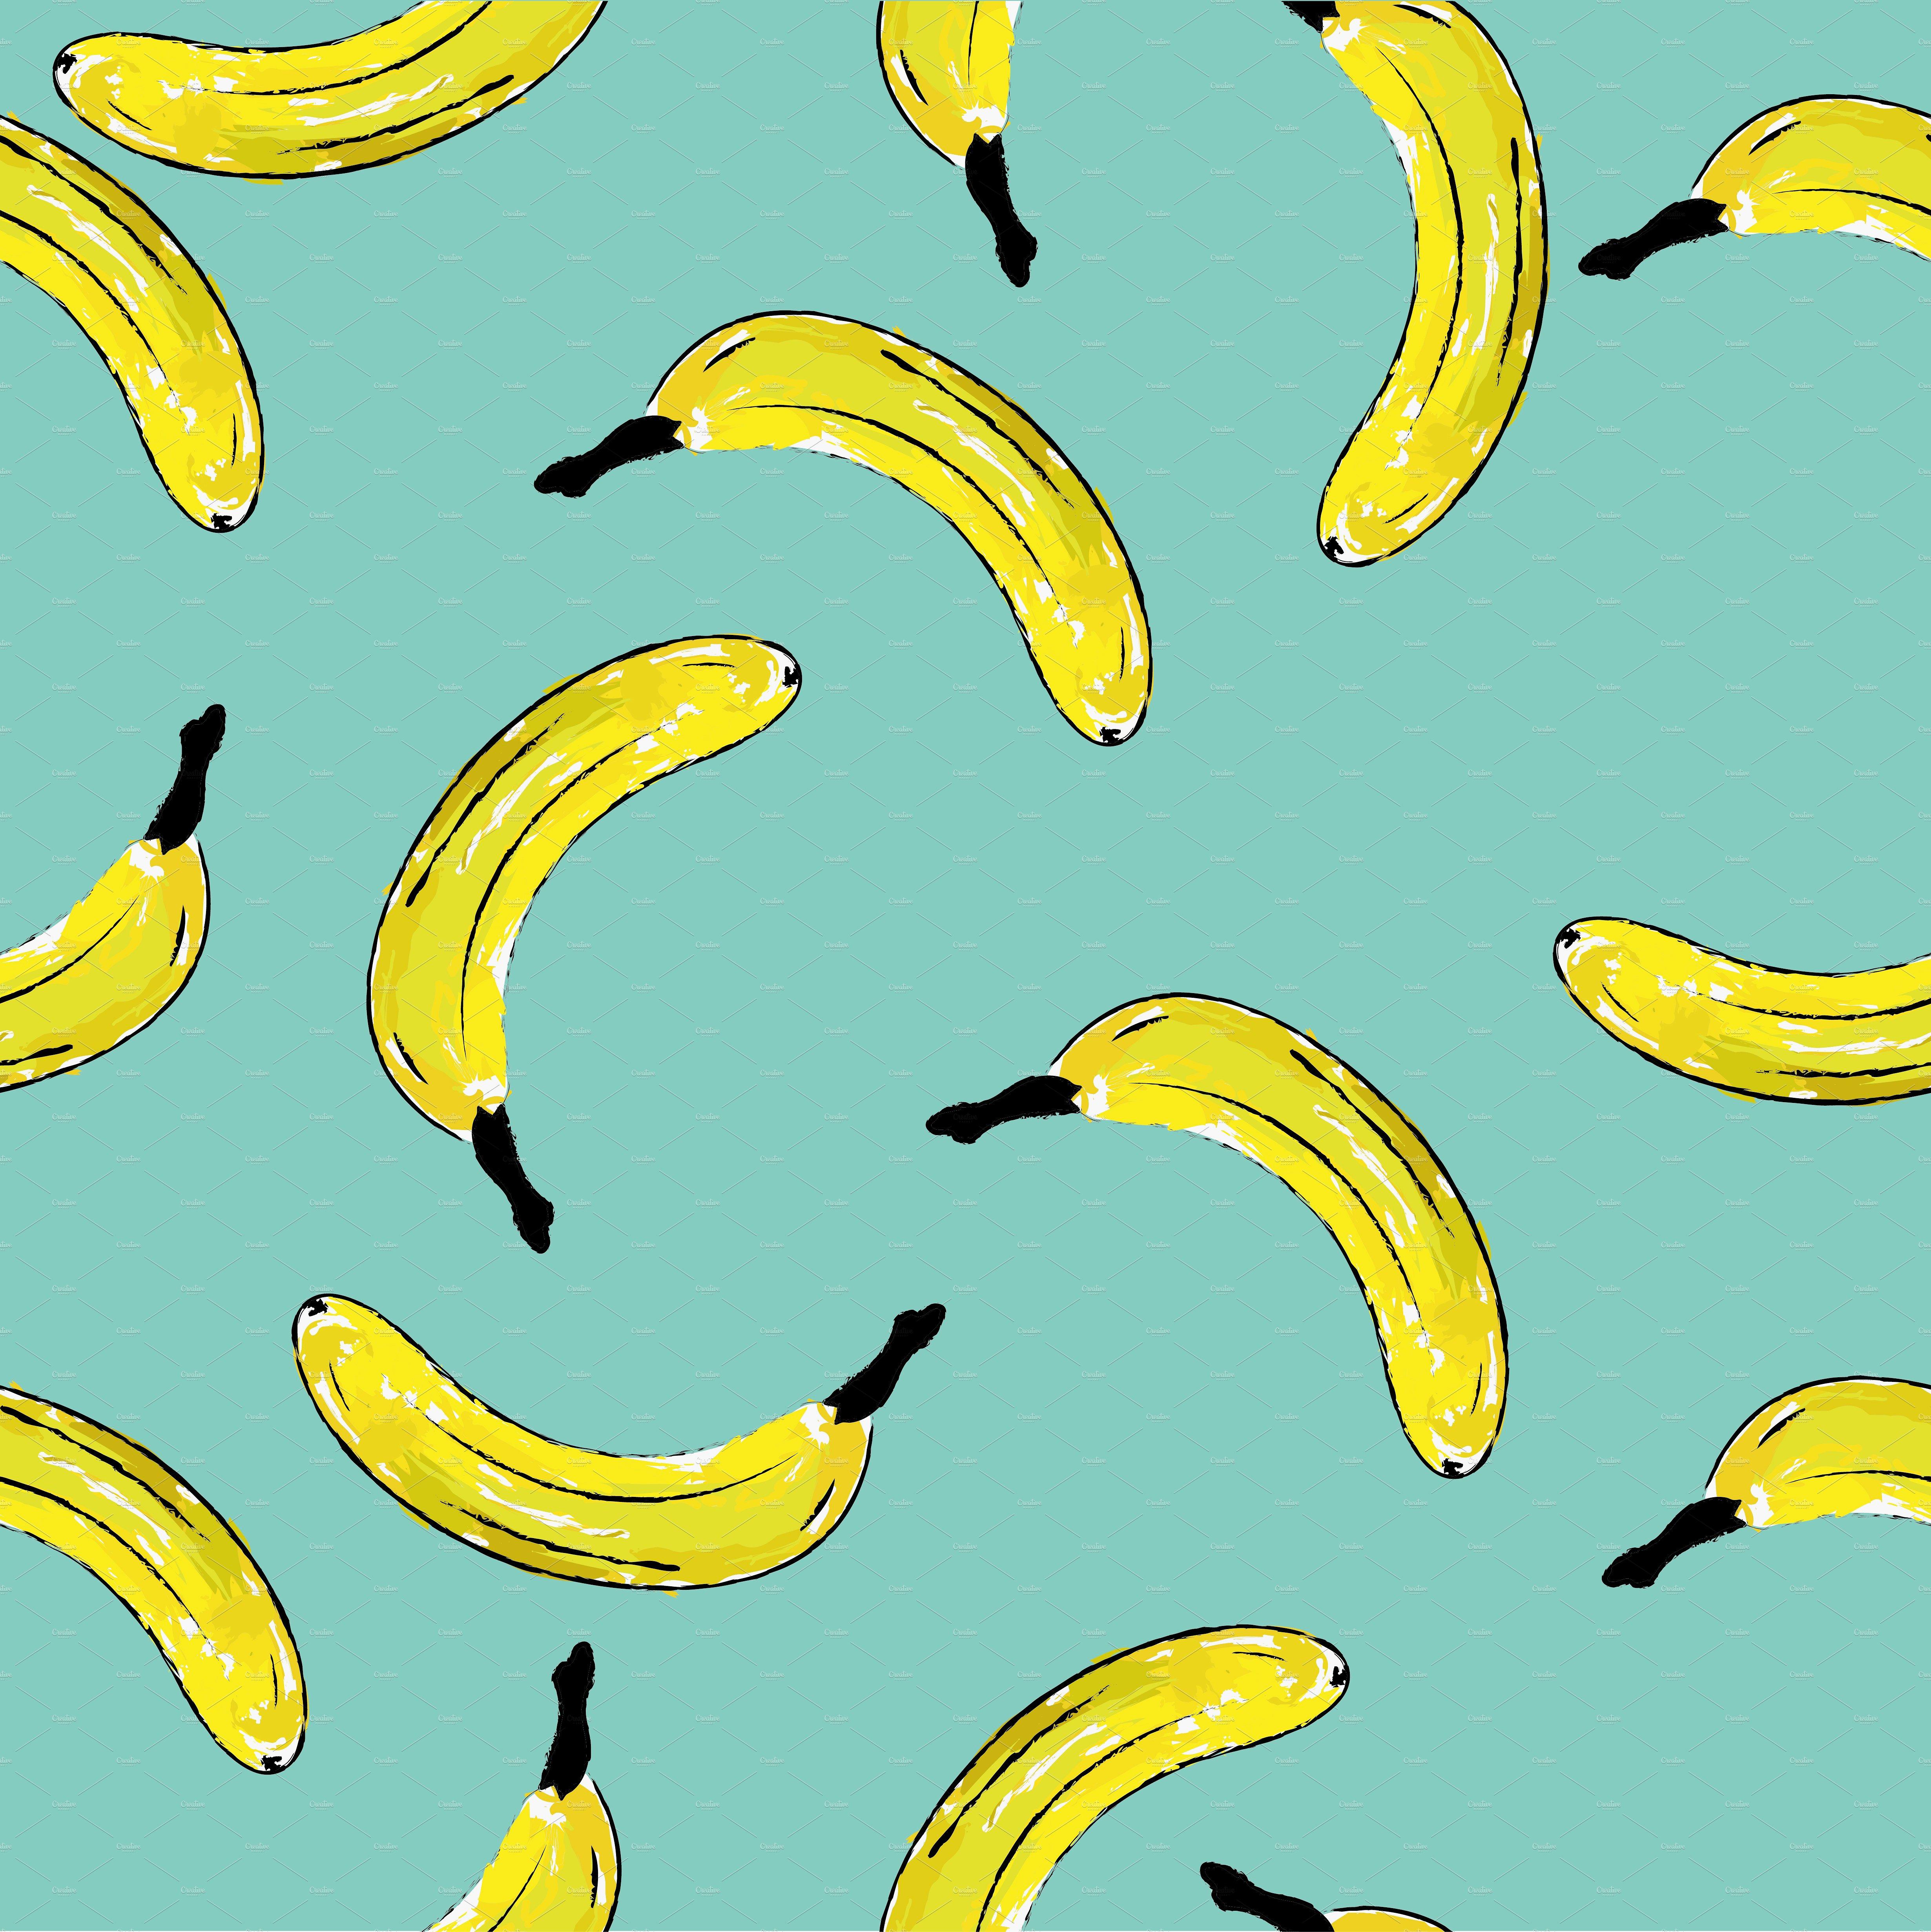 Free photo: Yellow (Banana) on Yellow (Background ...